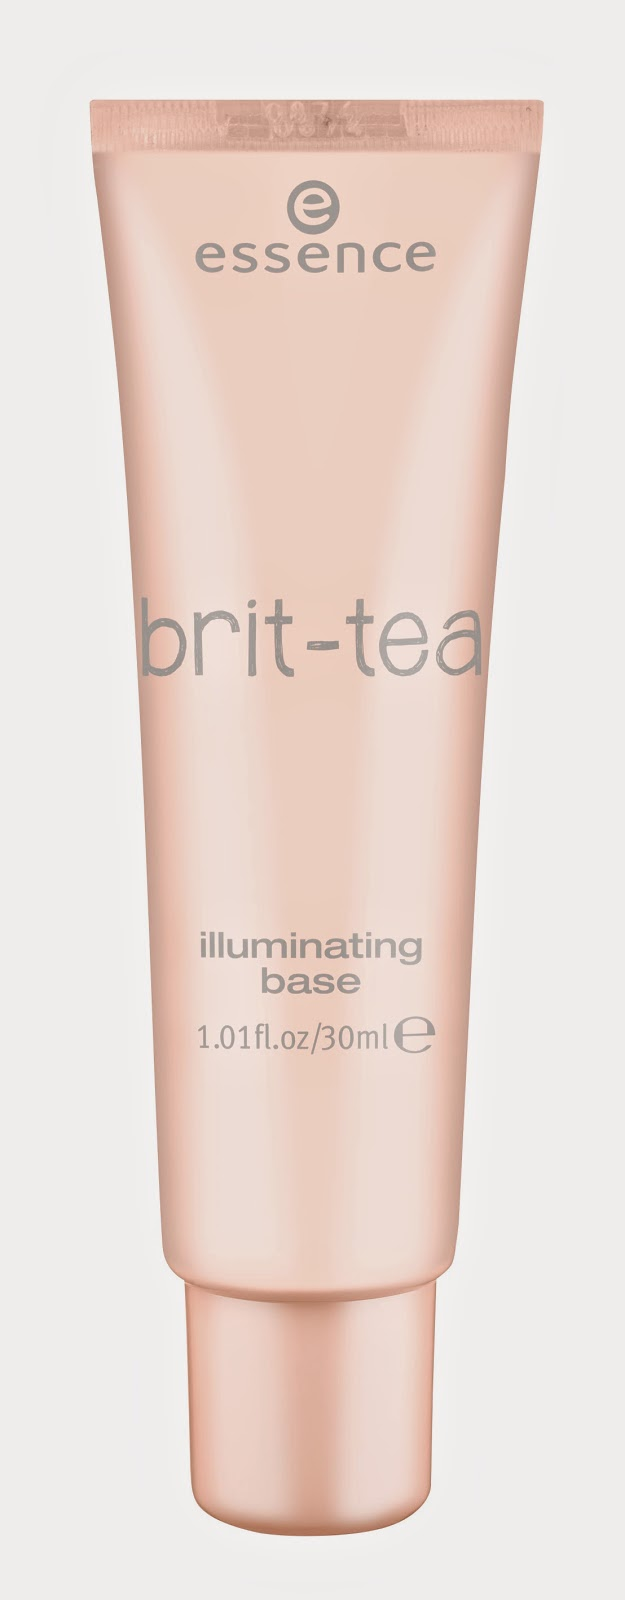 essence brit-tea – illuminating base - www.annitschkasblog.de